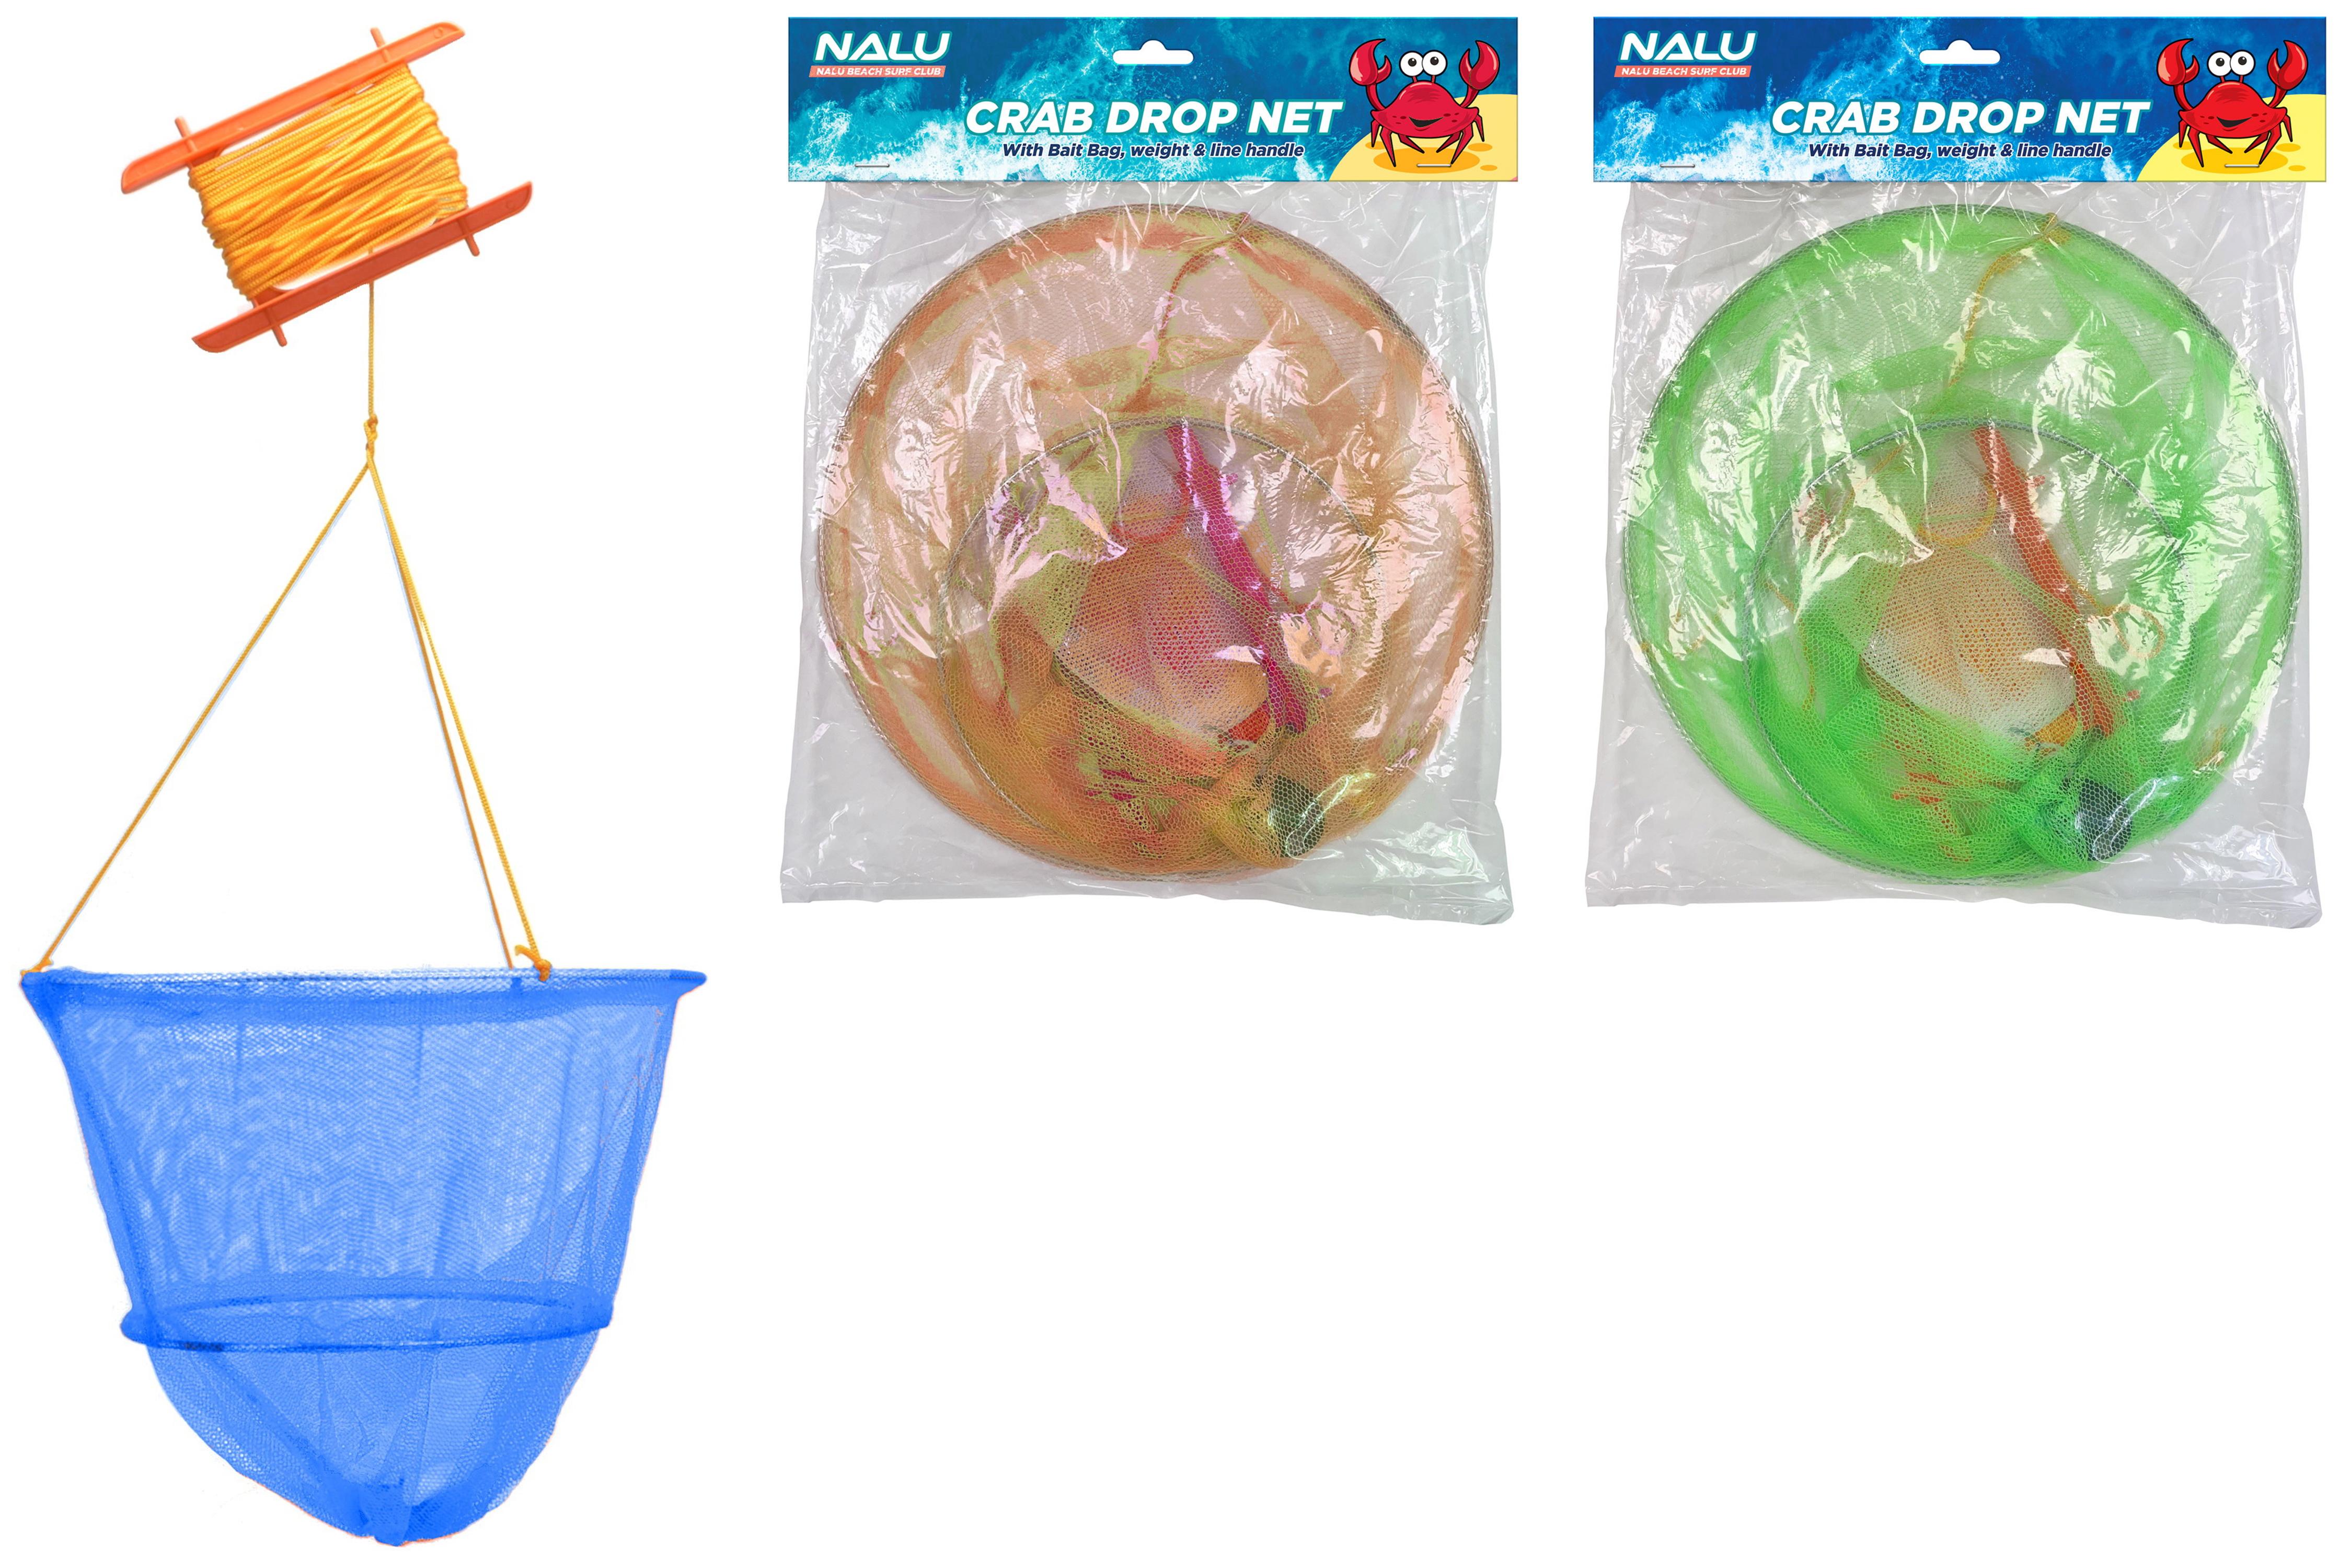 25cm/30cm 2 Ring Crab Drop Net With Bait Bag Neon Cols